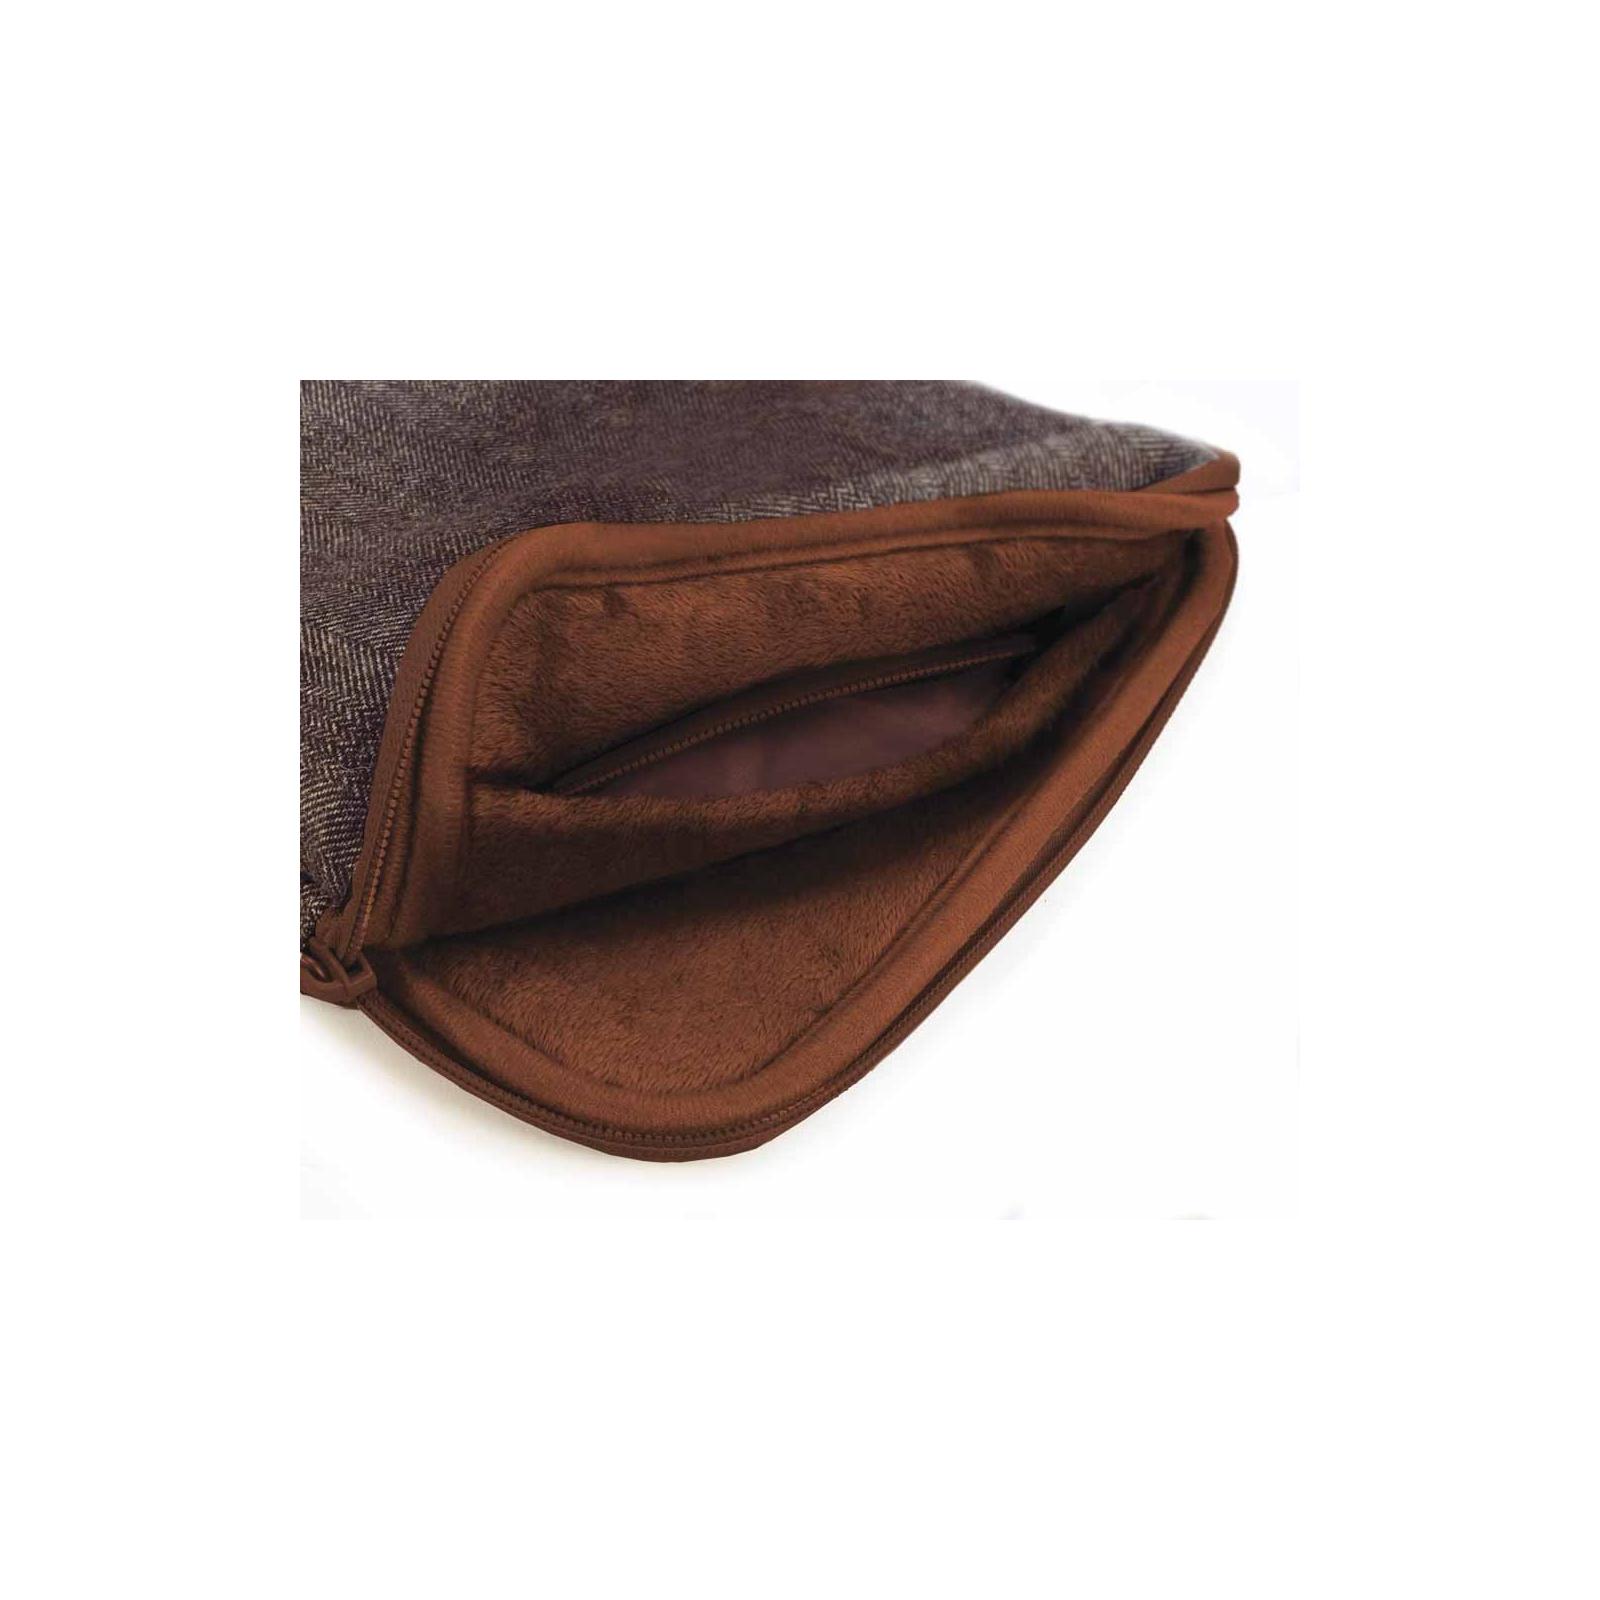 Чехол для планшета Tuff-Luv 7 Herringbone Tweed Brown (A3_18) изображение 2